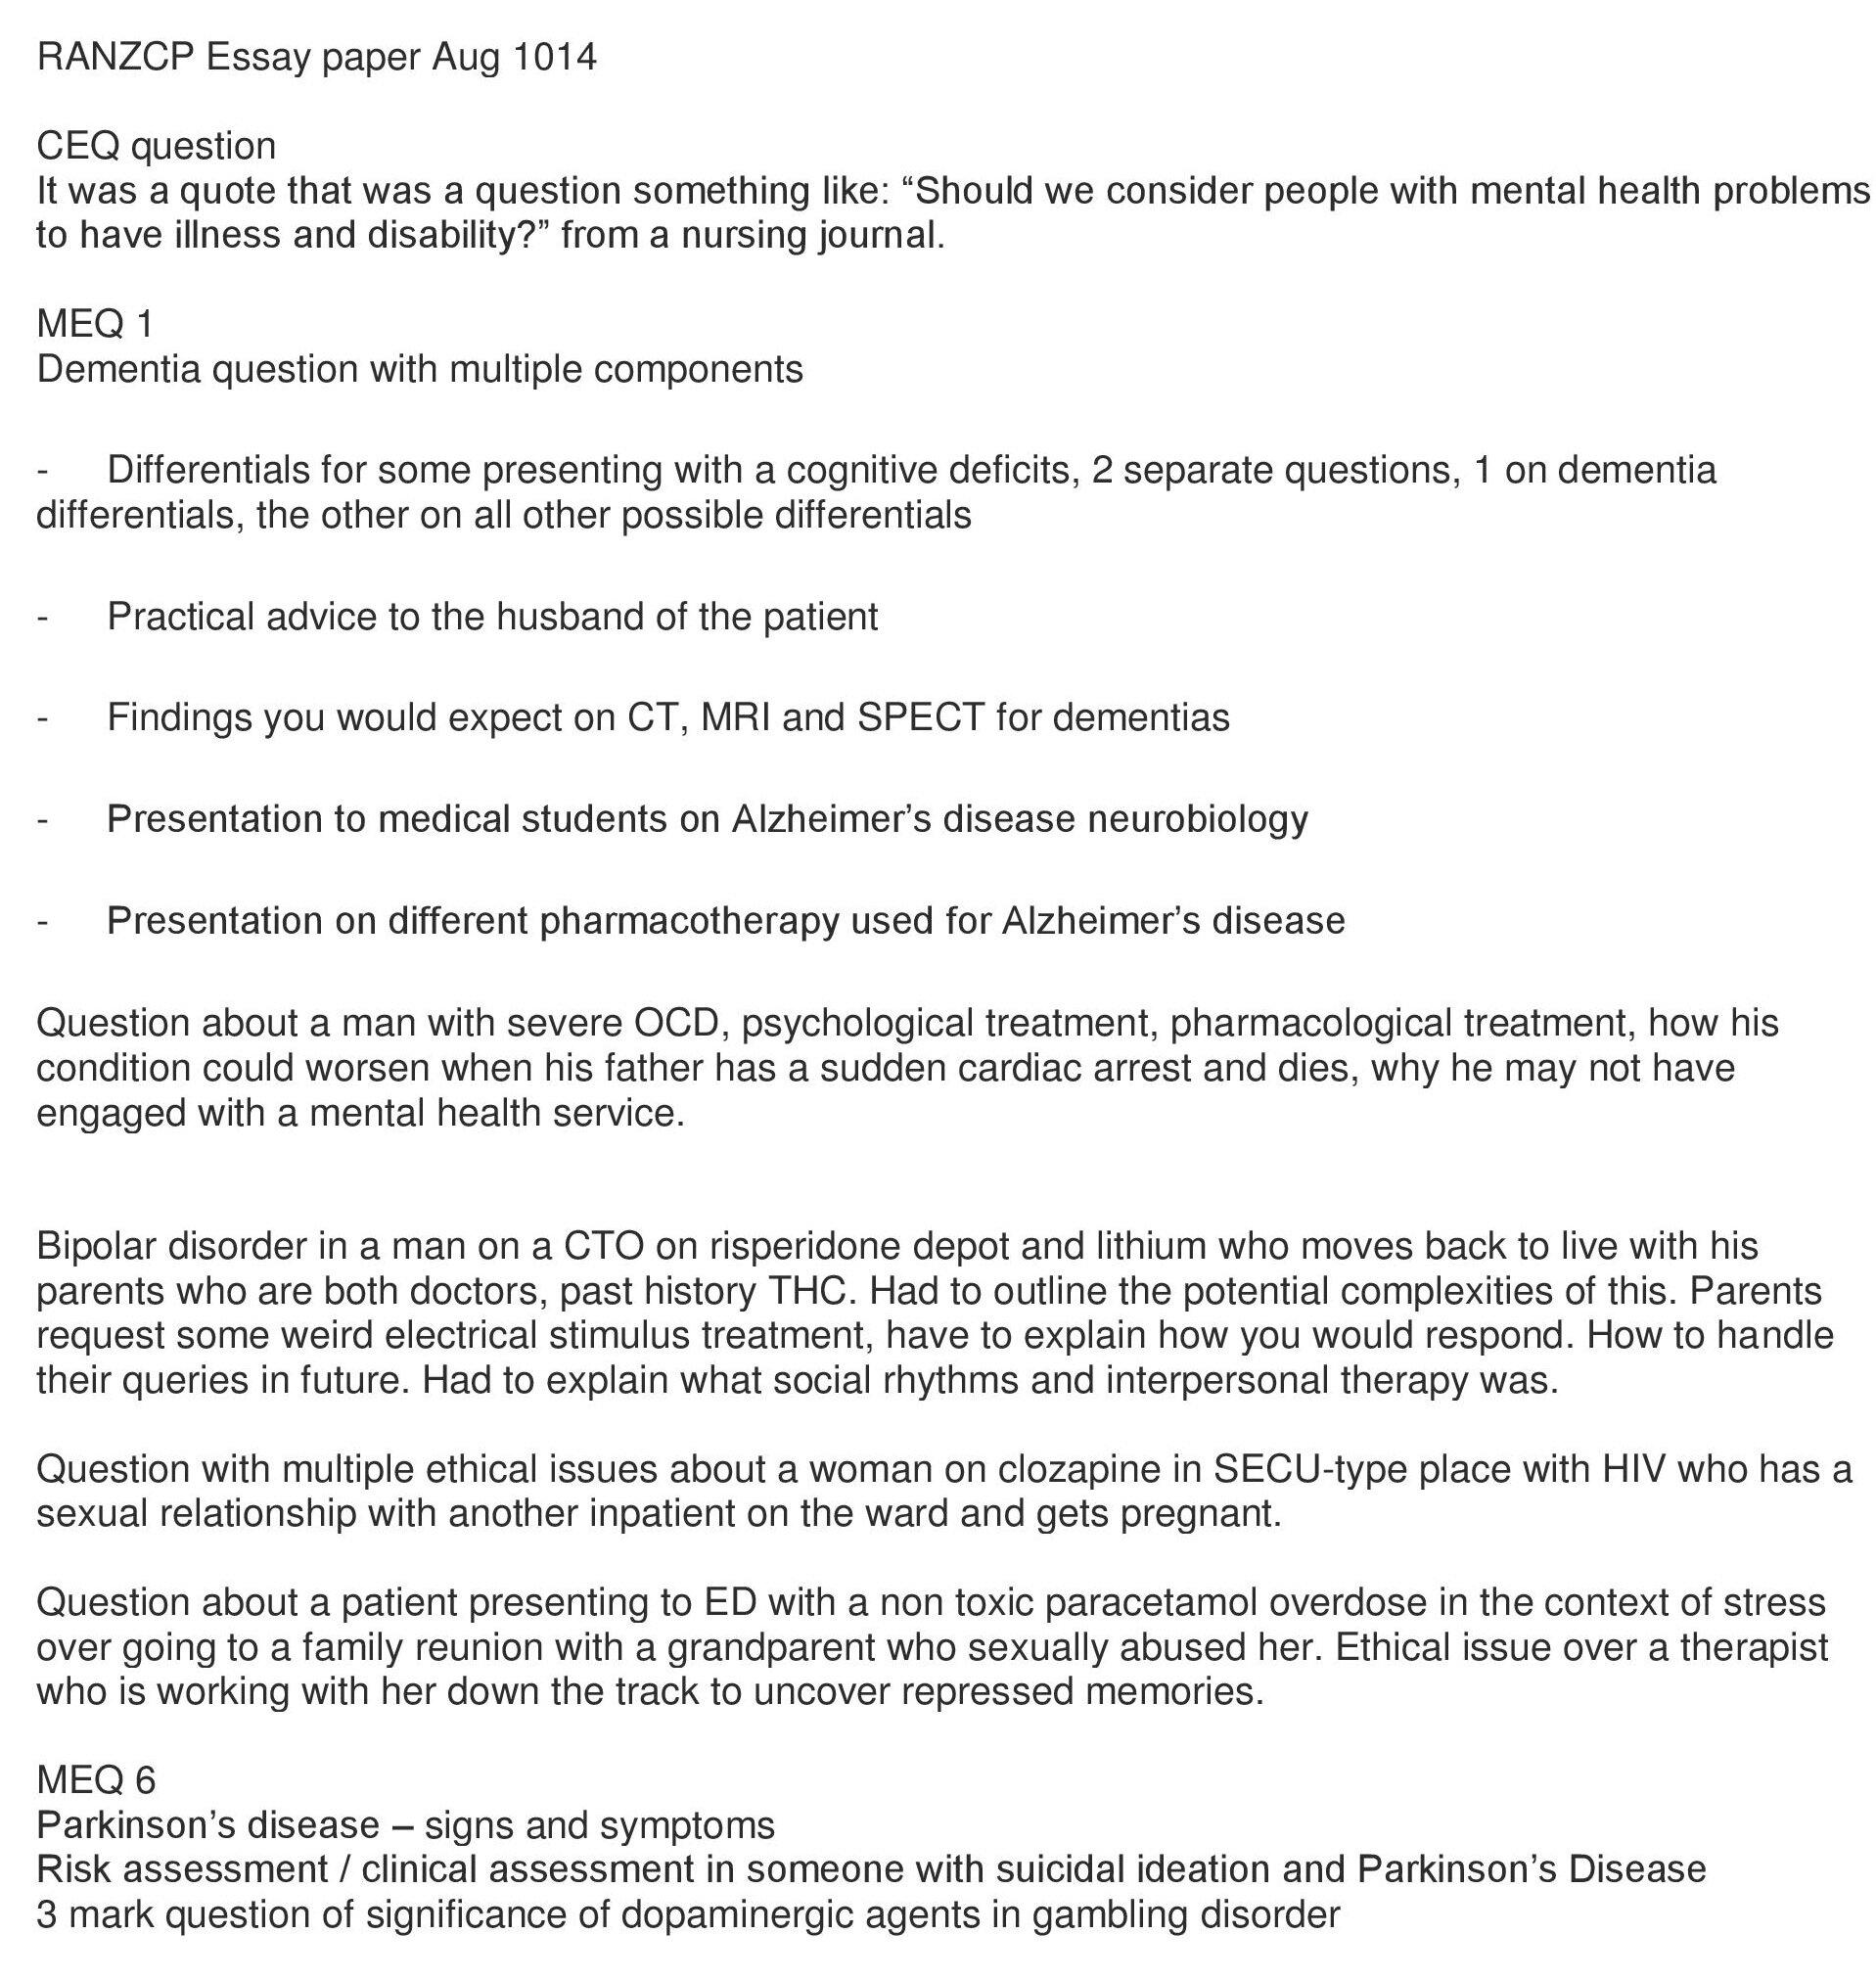 RANZCP+essay+paper+Aug+2014-page-001.jpg